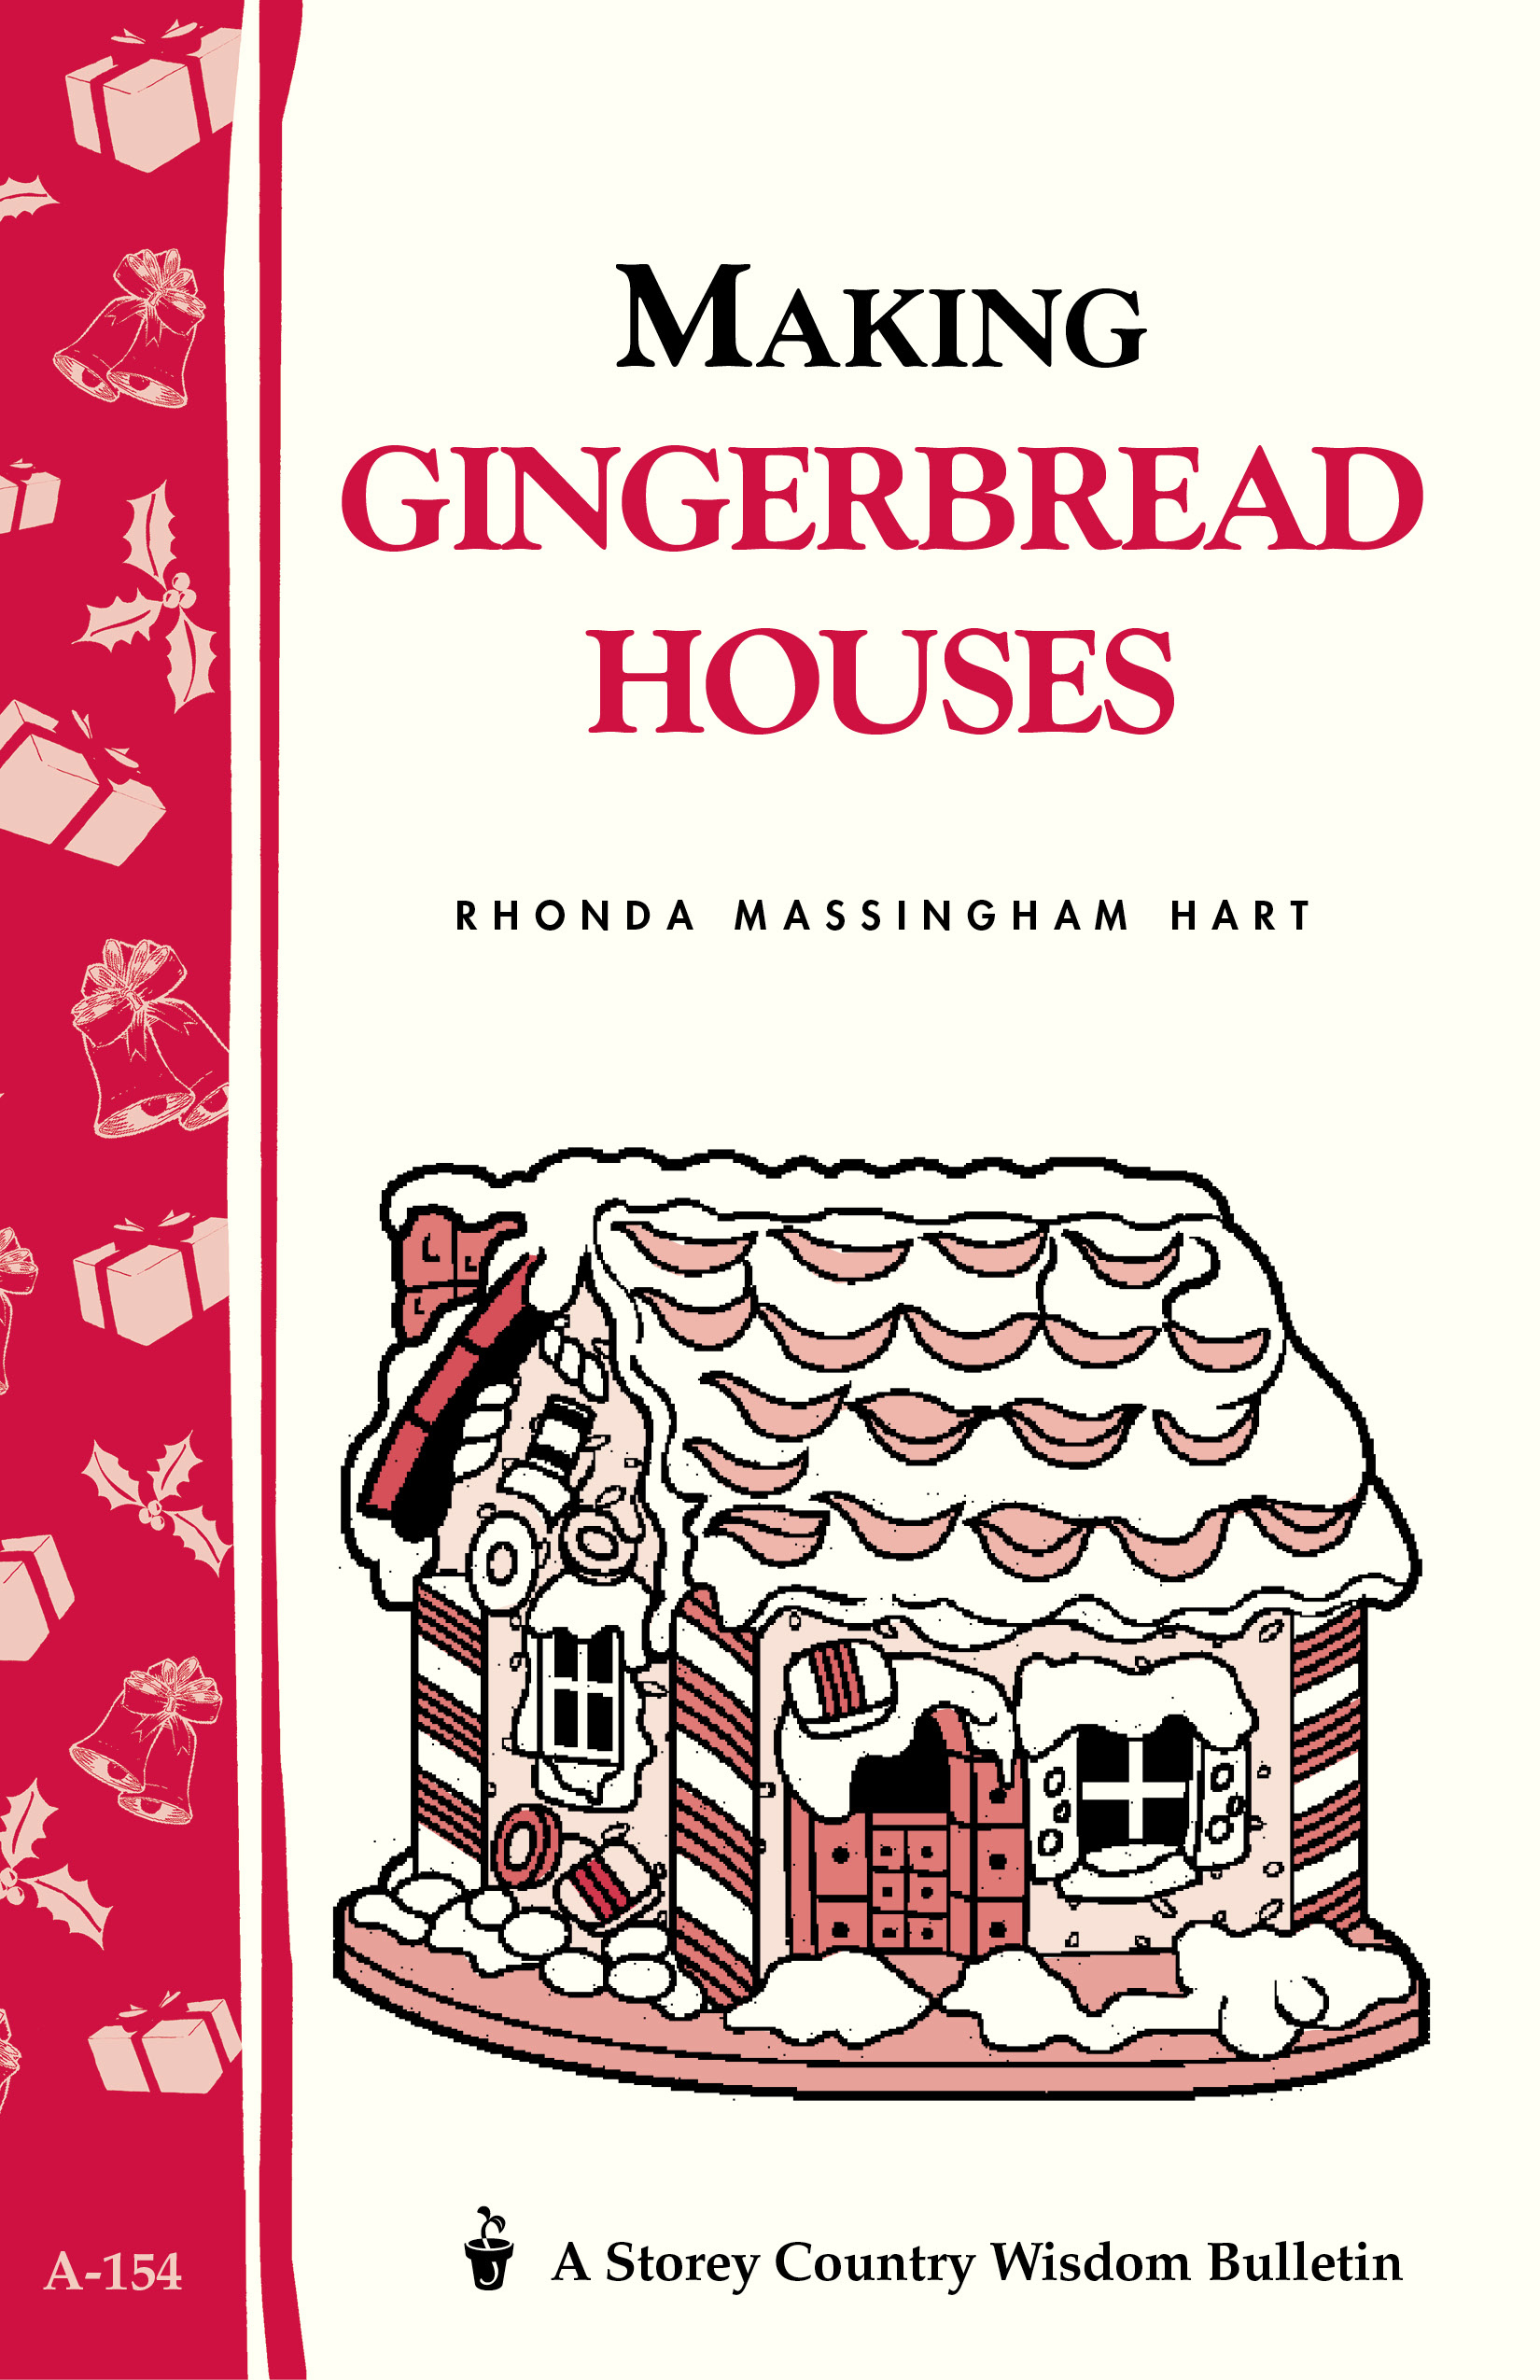 Making Gingerbread Houses Storey Country Wisdom Bulletin A-154 - Rhonda Massingham Hart